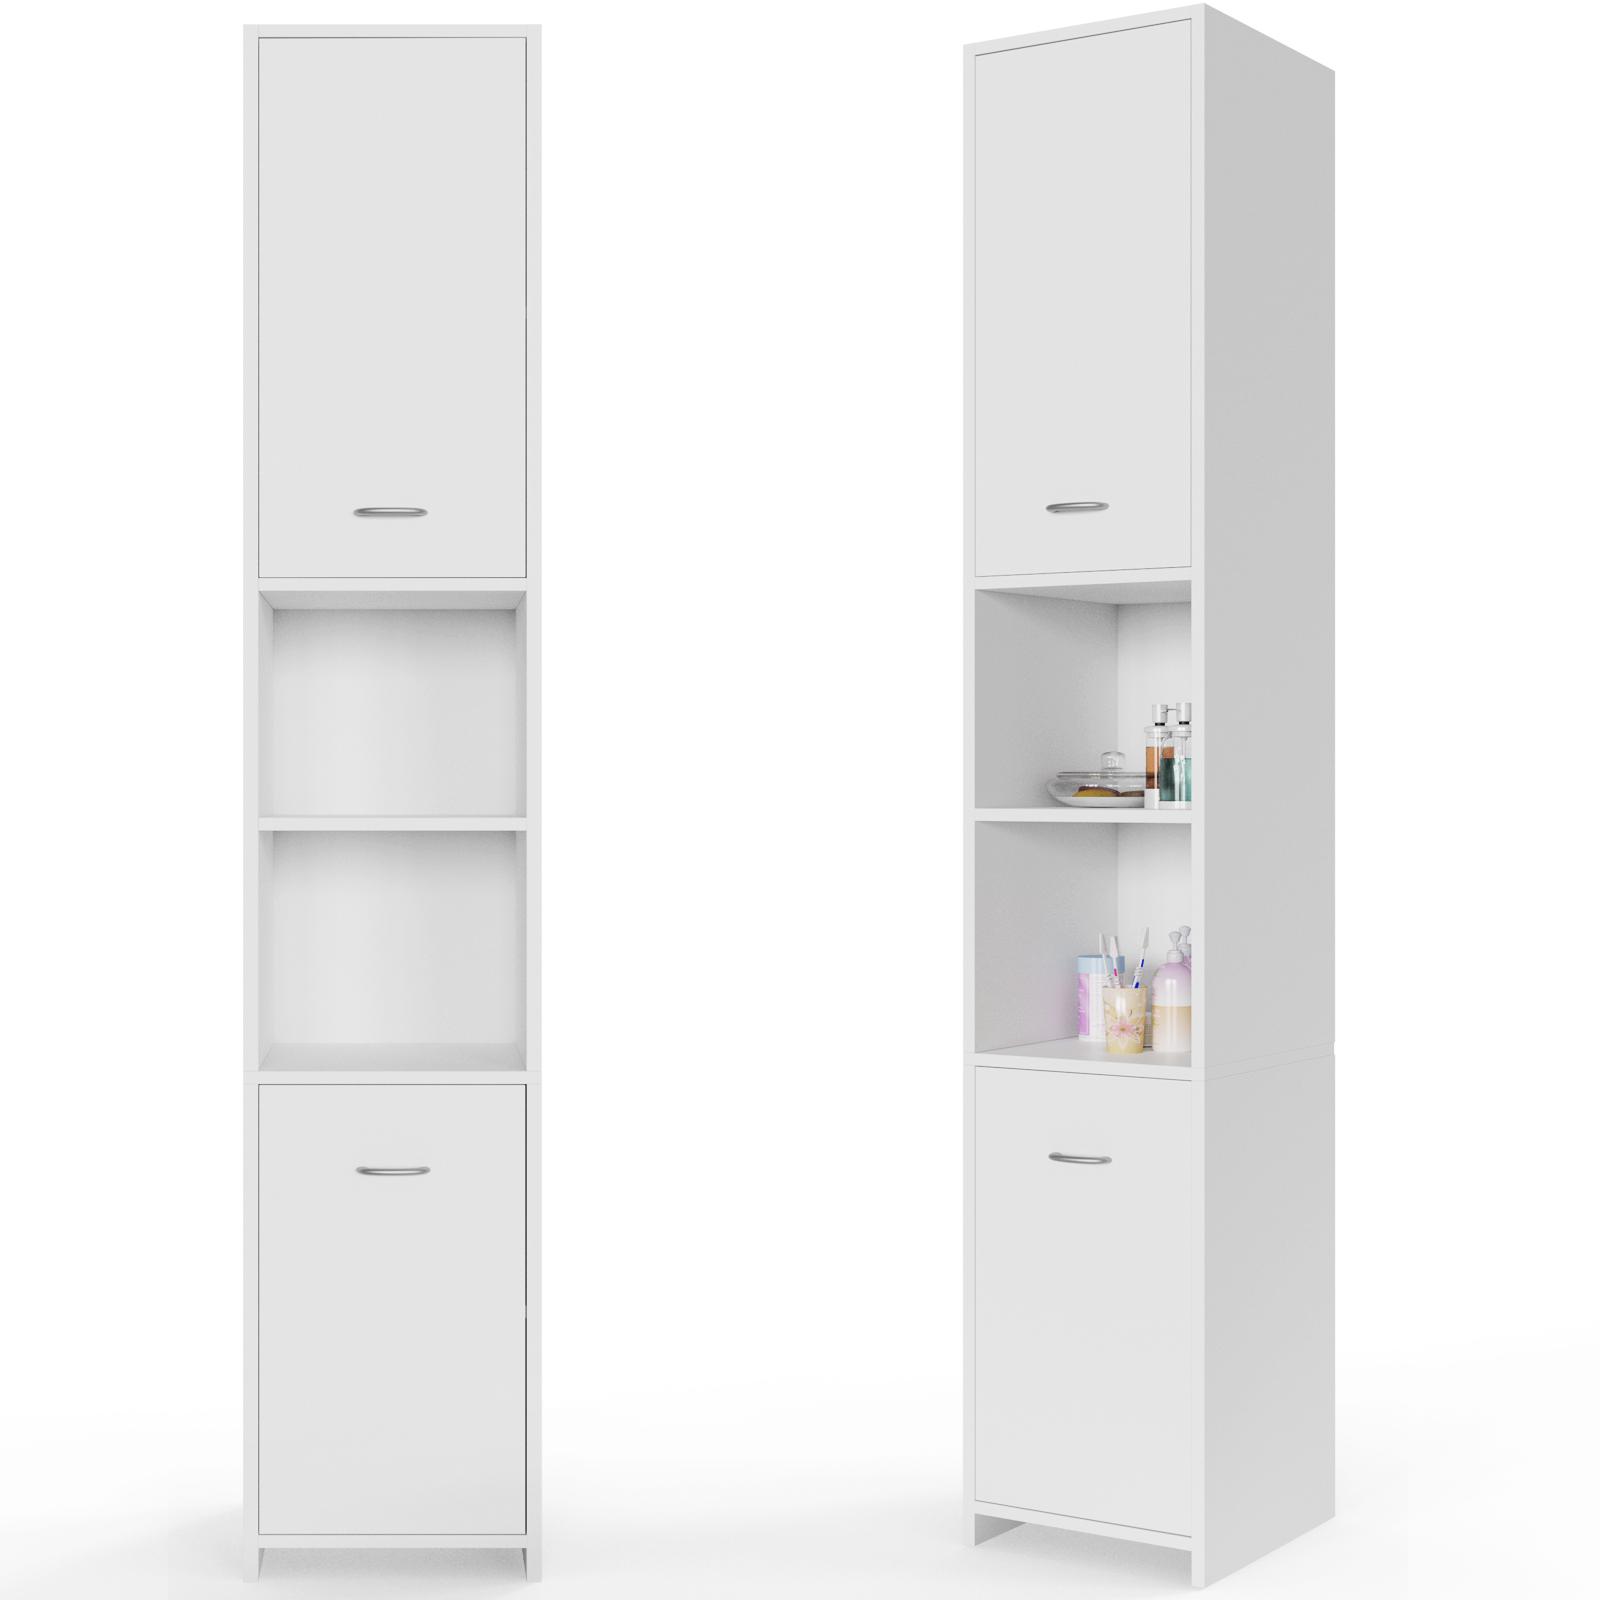 Deuba armario alto de ba o estanteria de ba o color blanco estante con puertas ebay - Armarios de bano altos ...